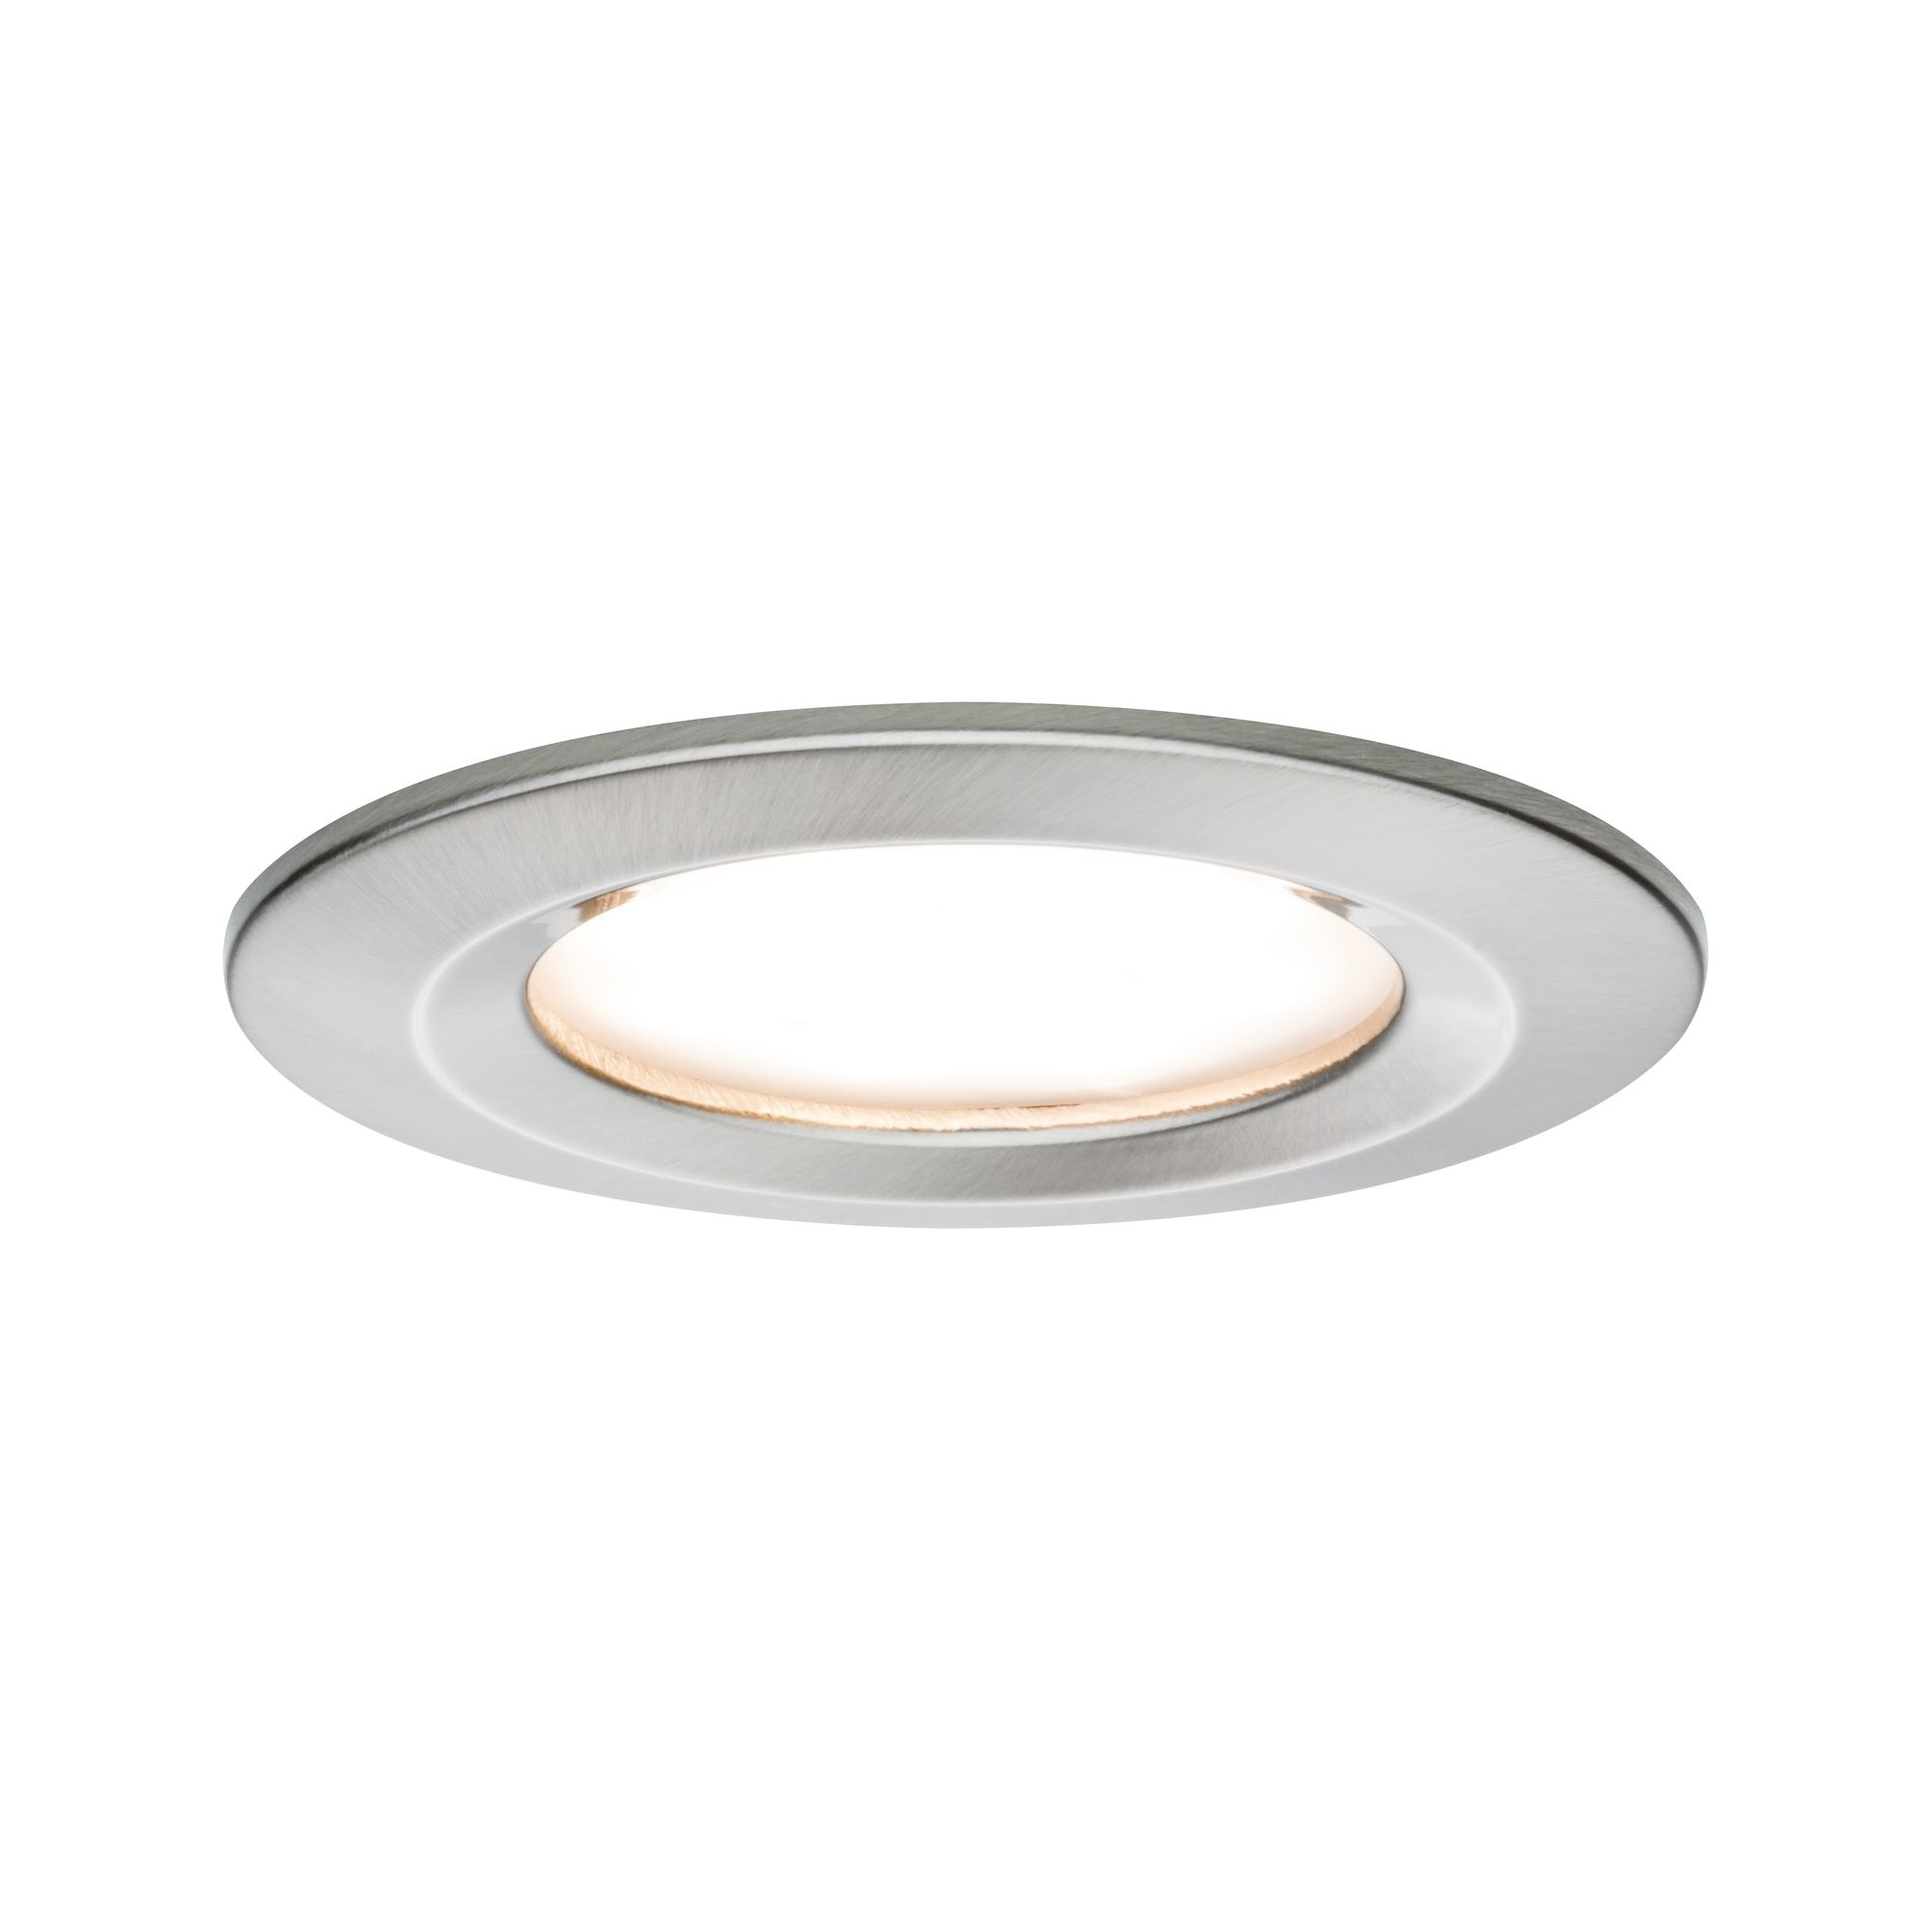 Paulmann EBL Set Nova Coin rund starr LED 1x6,5W2700K 230V Eisen geb/Alu